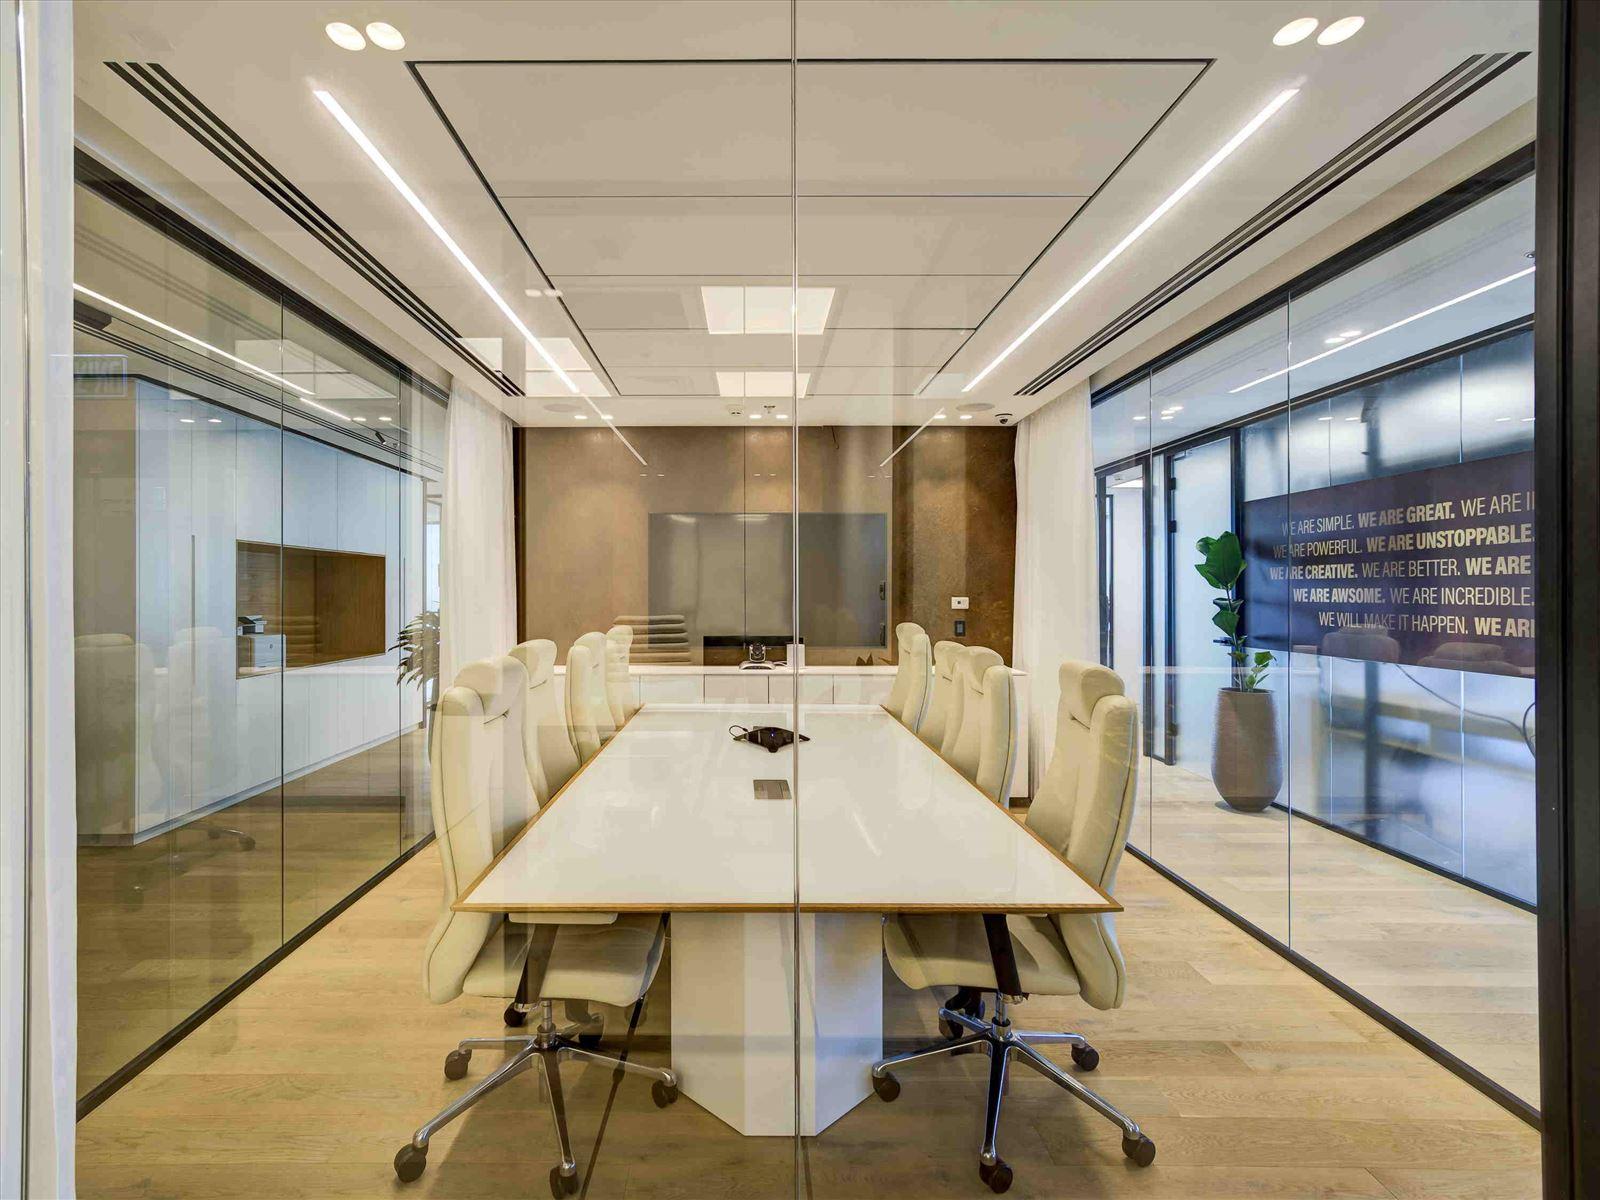 Pi Technology Office - תאורה בחדר הישיבות על ידי דורי קמחי